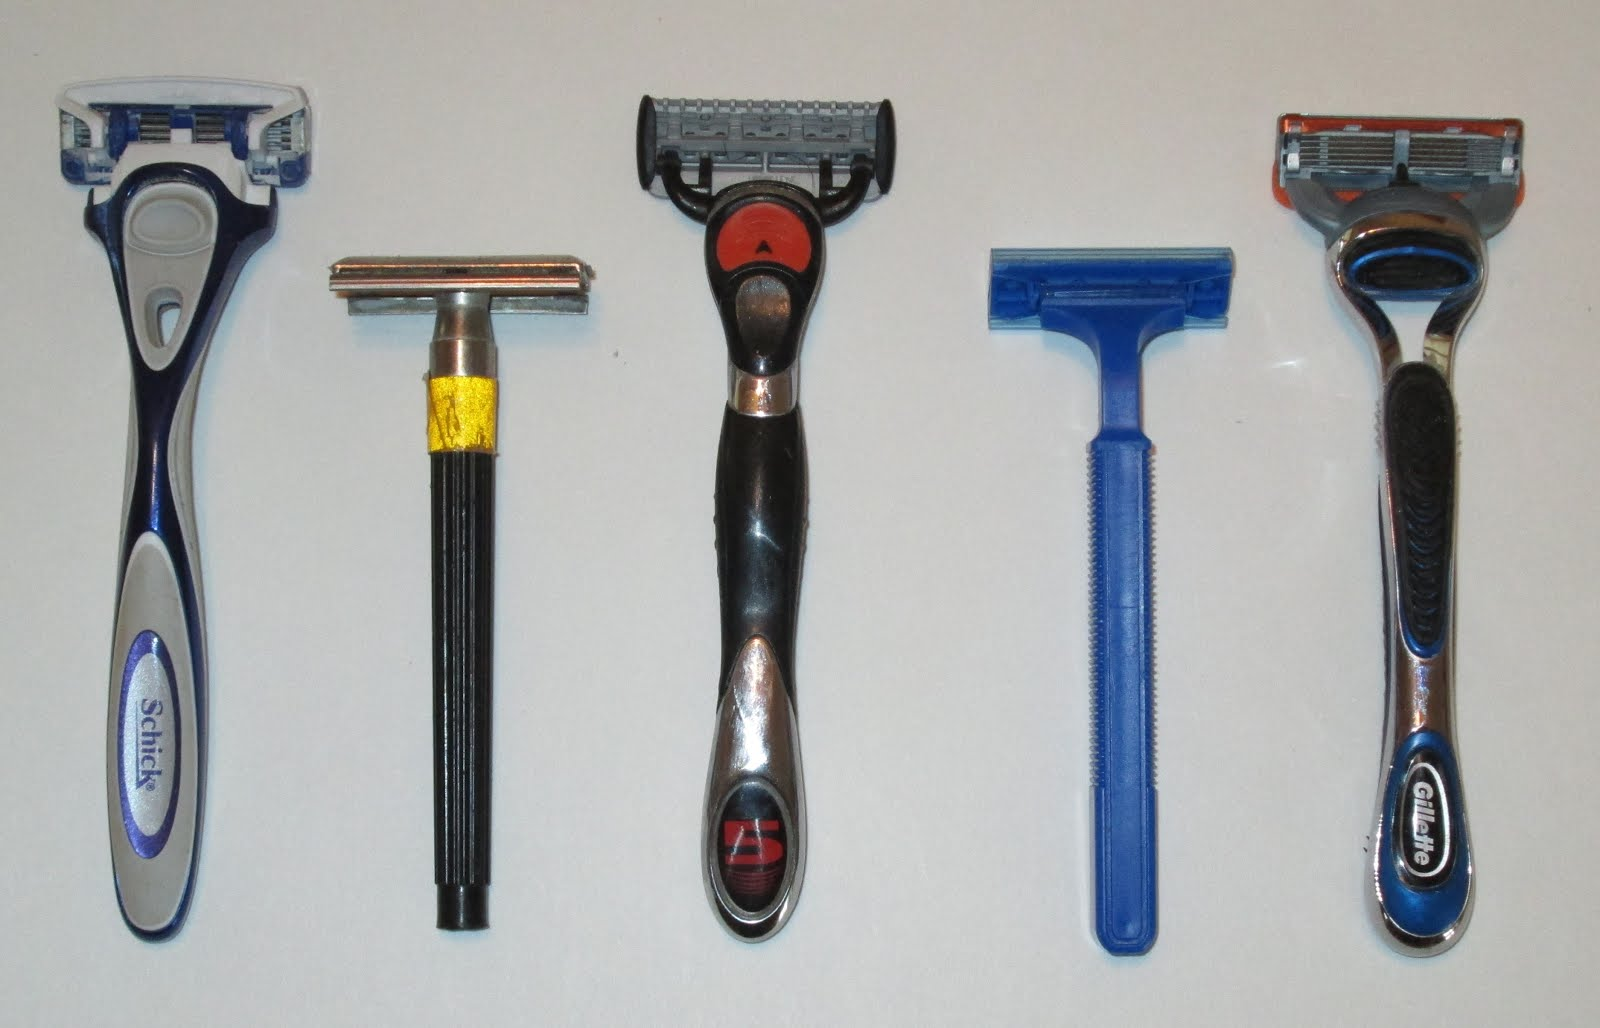 Keep Quiet: Sustainable Design - Razors - 5 blade, 4 blade ...